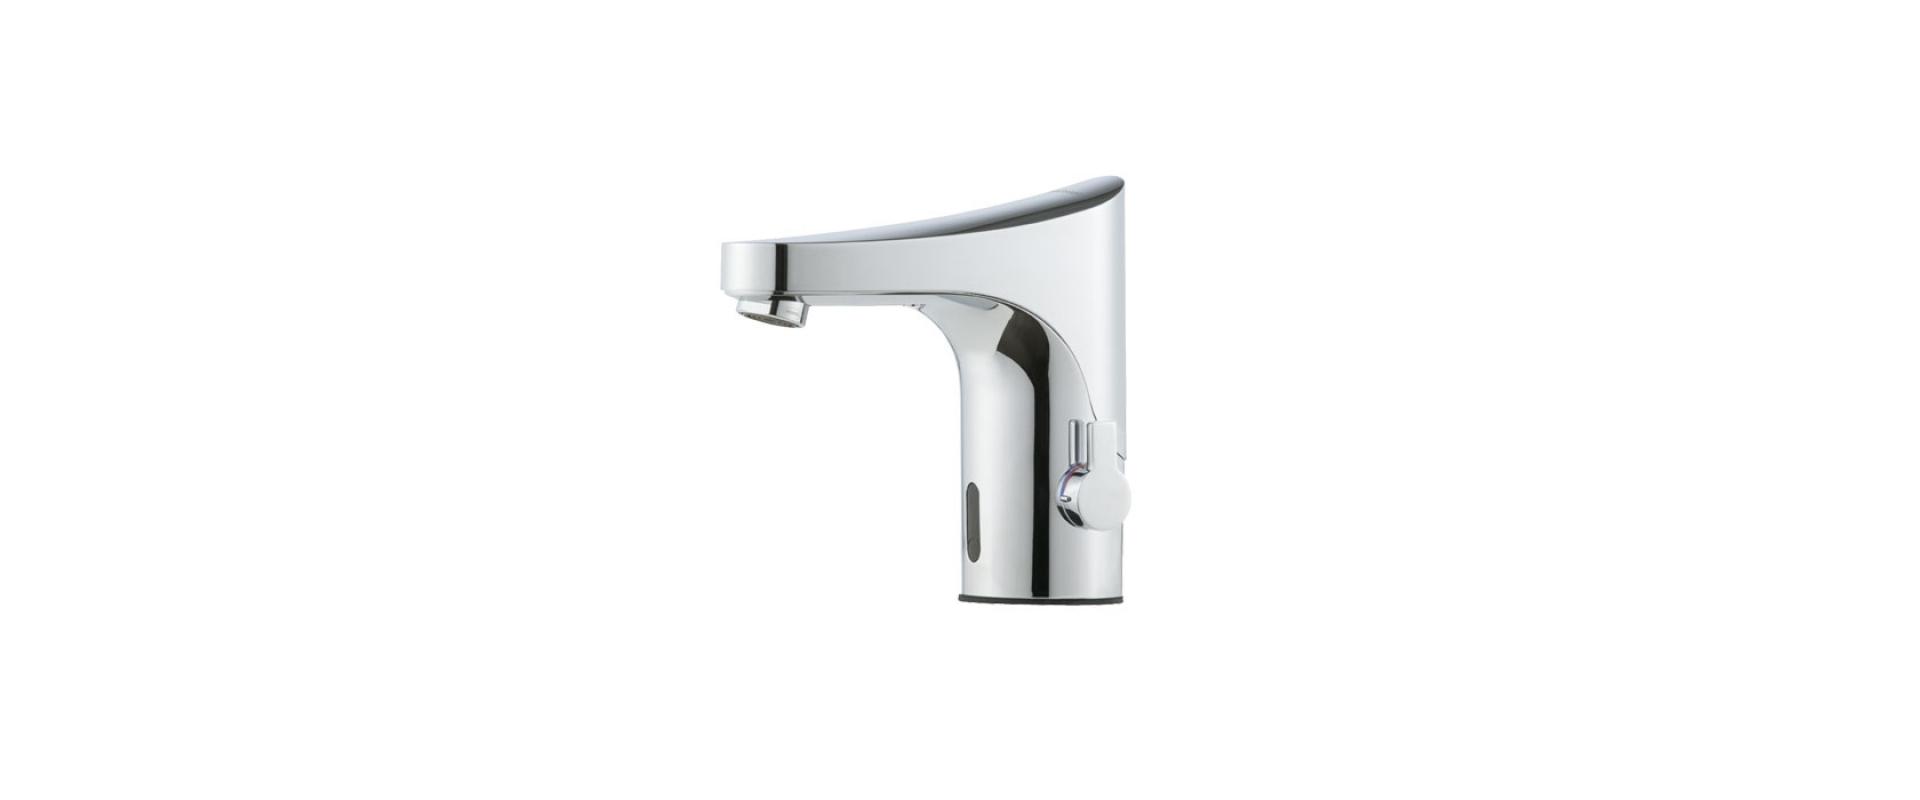 Tvättställsblandare 425-110